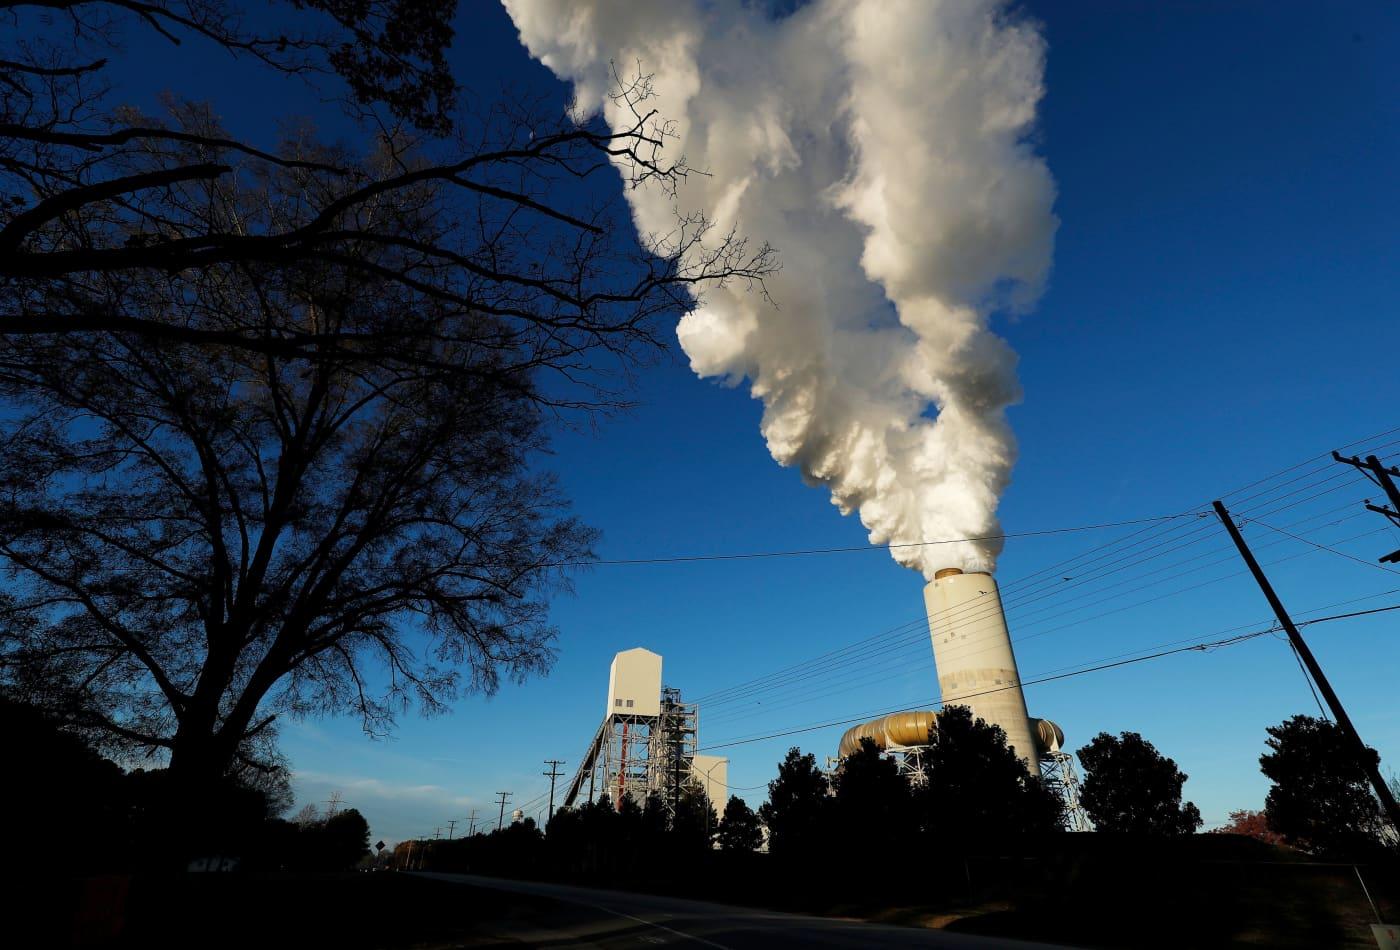 An activist investor may urge Duke Energy to 'get back to basics'